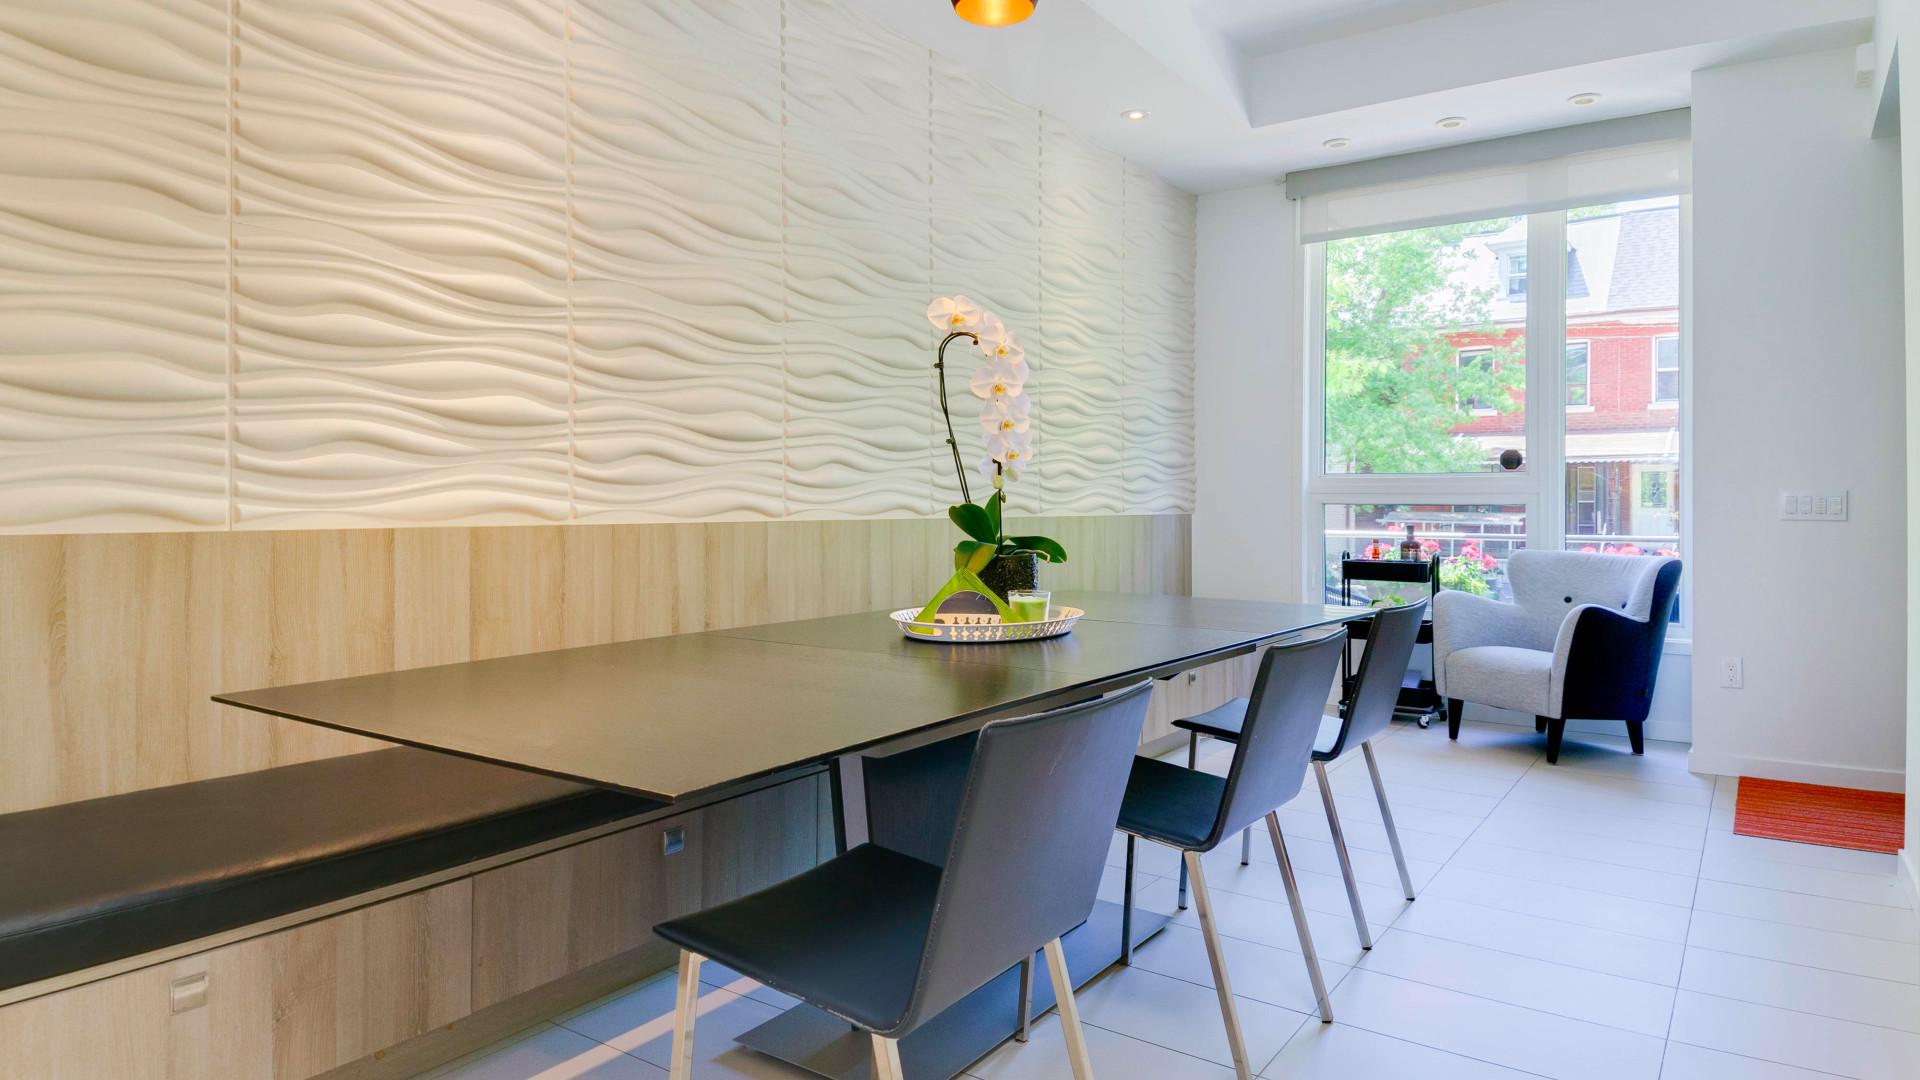 A sneak peek inside a $2.4 million designer town home at Bickford Park